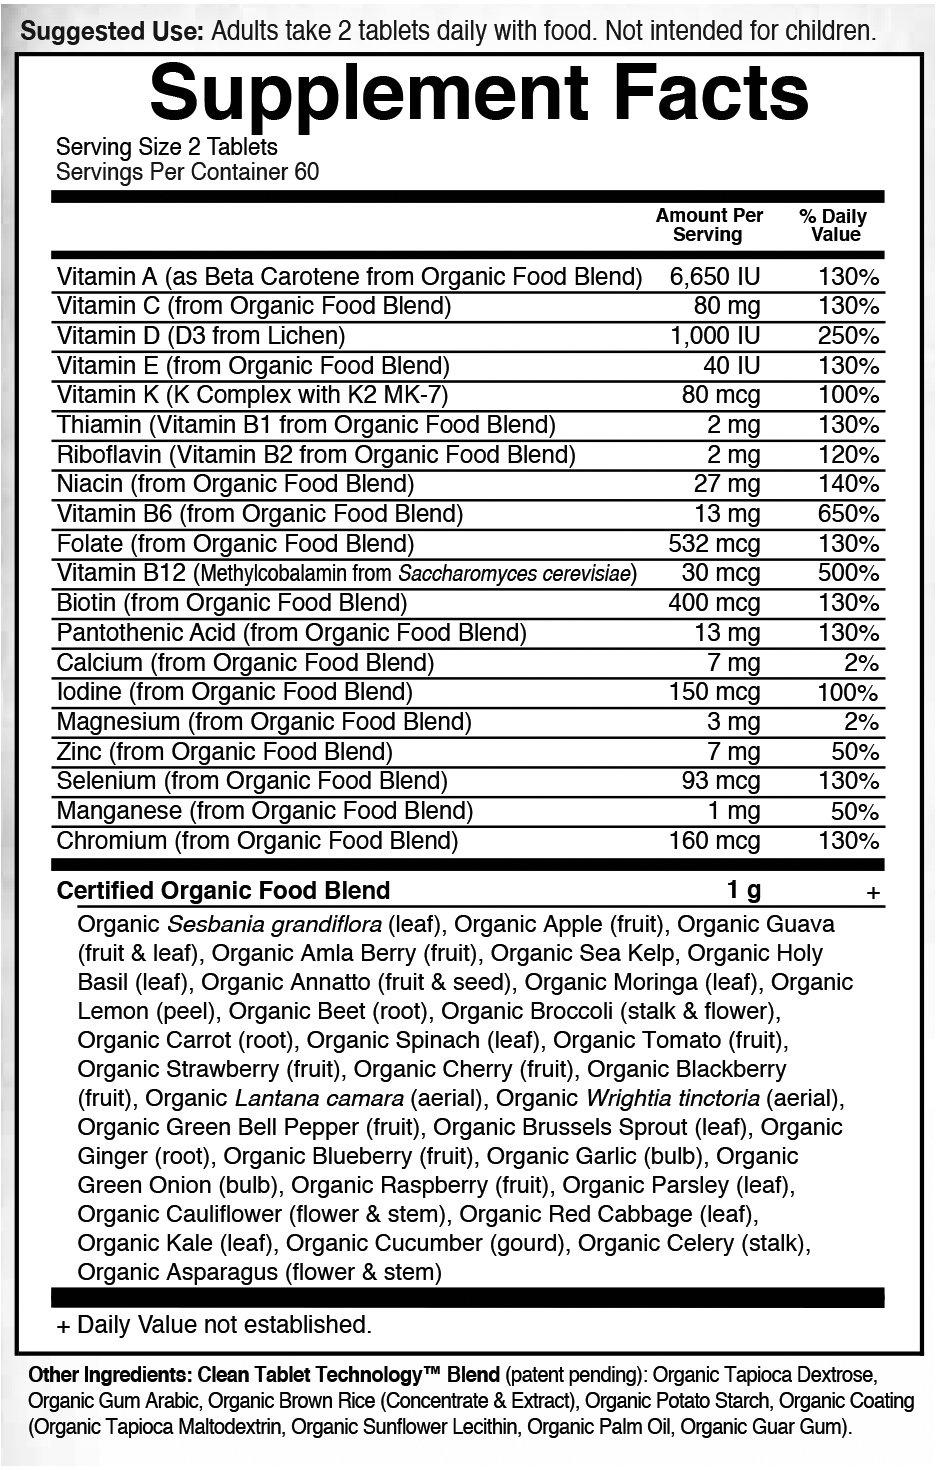 Garden of Life Multivitamin for Men - mykind Organic Men's Whole Food Vitamin Supplement, Vegan, 120 Tablets by Garden of Life (Image #6)